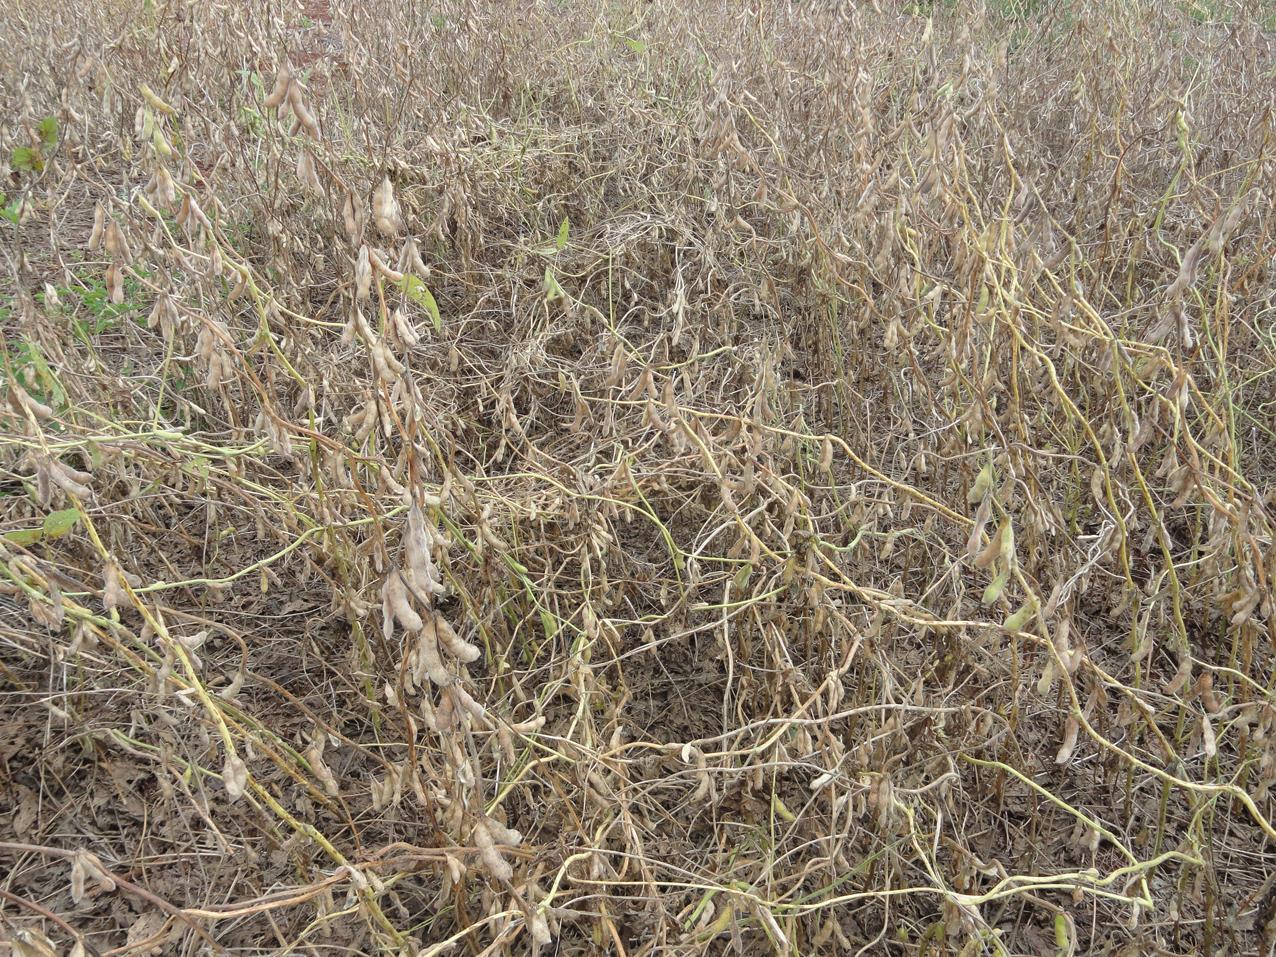 Acamamento de plantas na cultura da soja